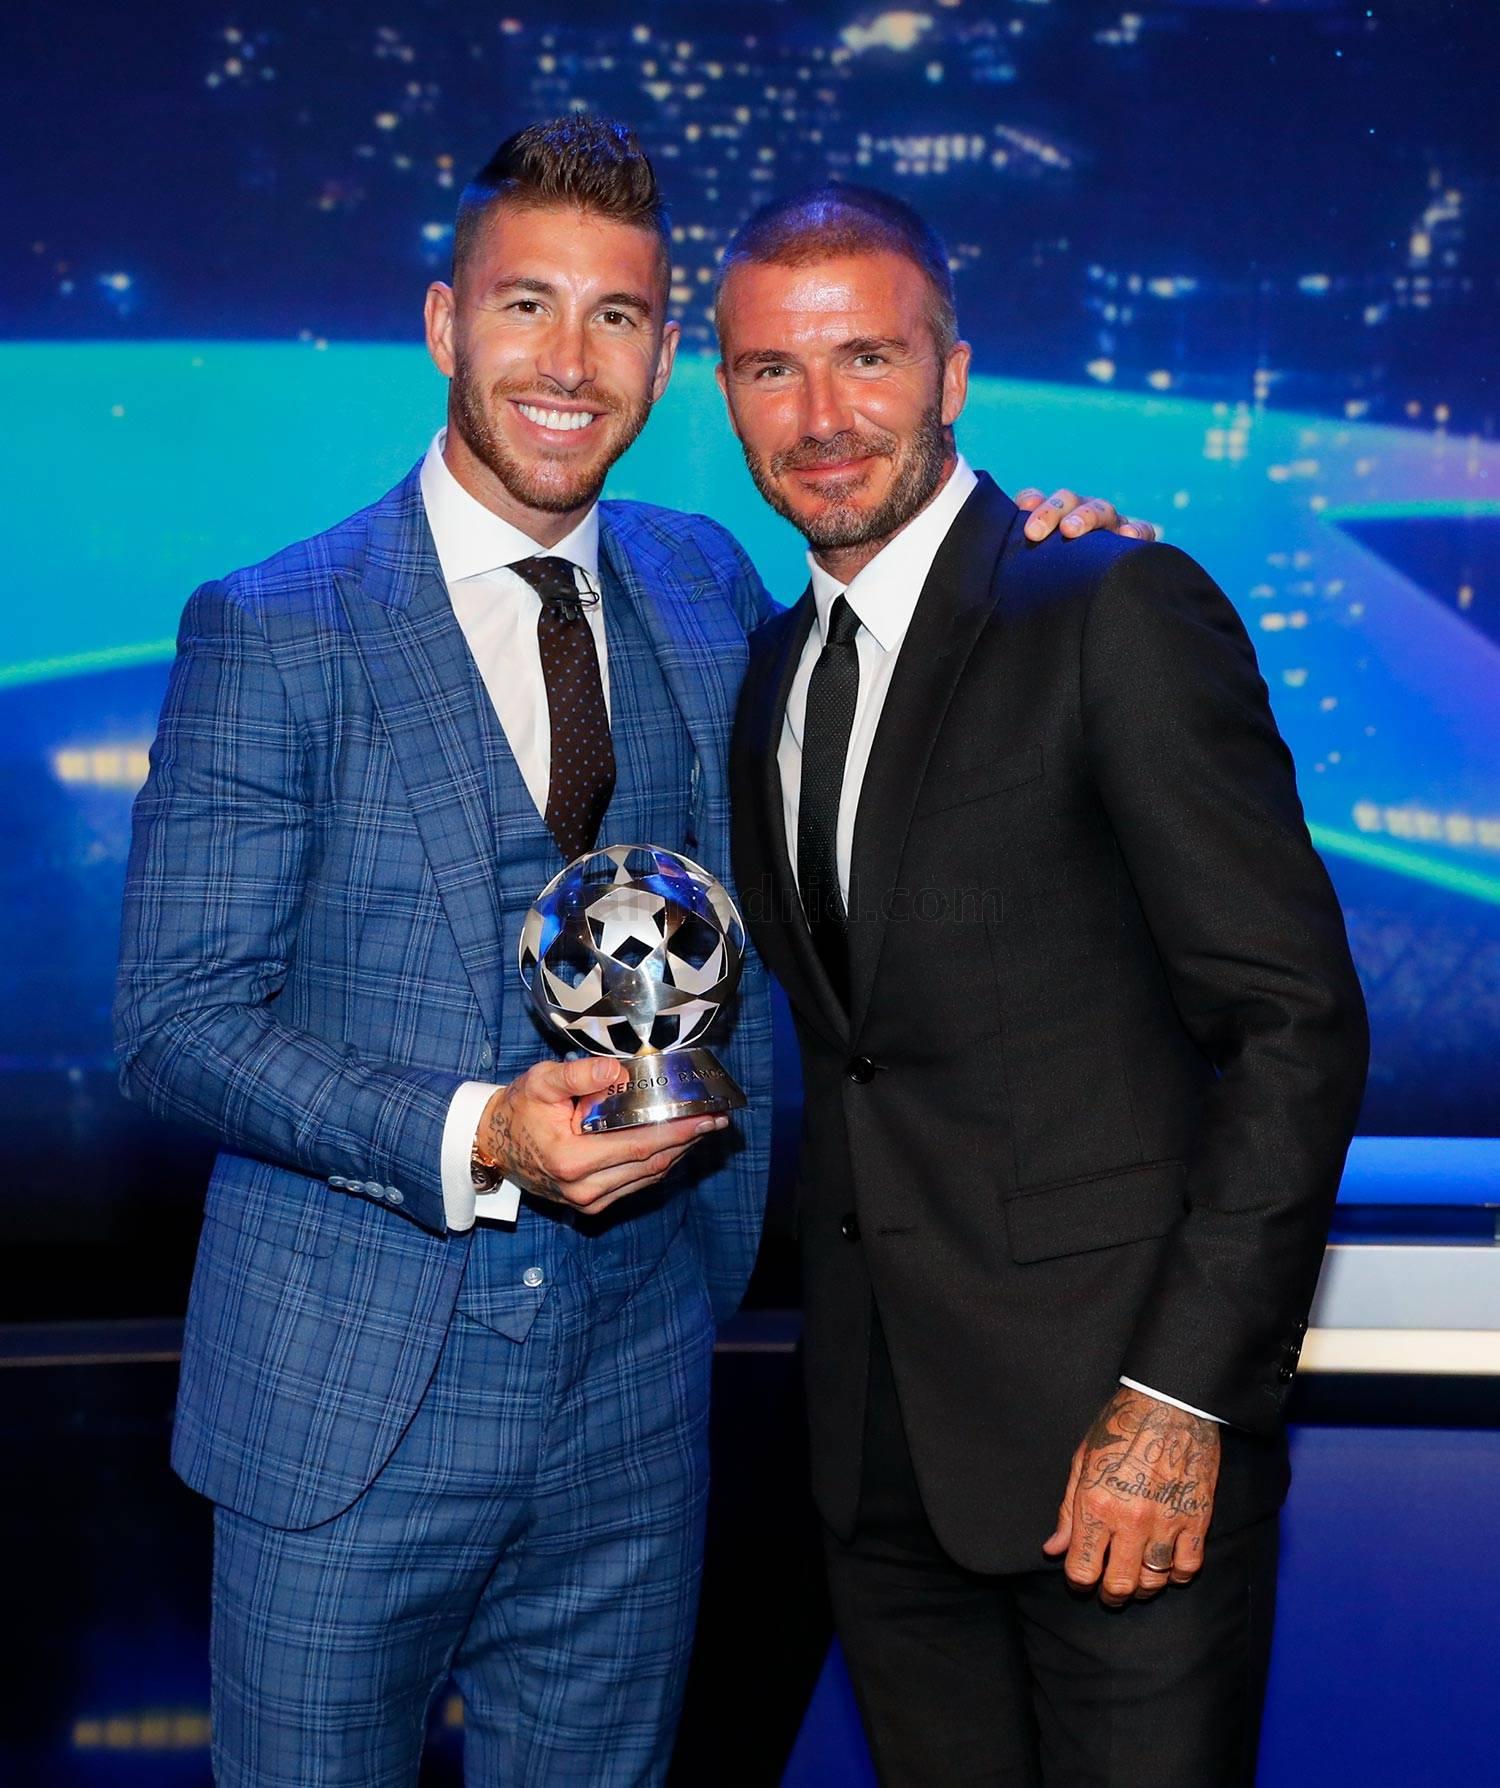 ¿Cuánto mide David Beckham? - Altura - Real height _3am9485_20180830083055